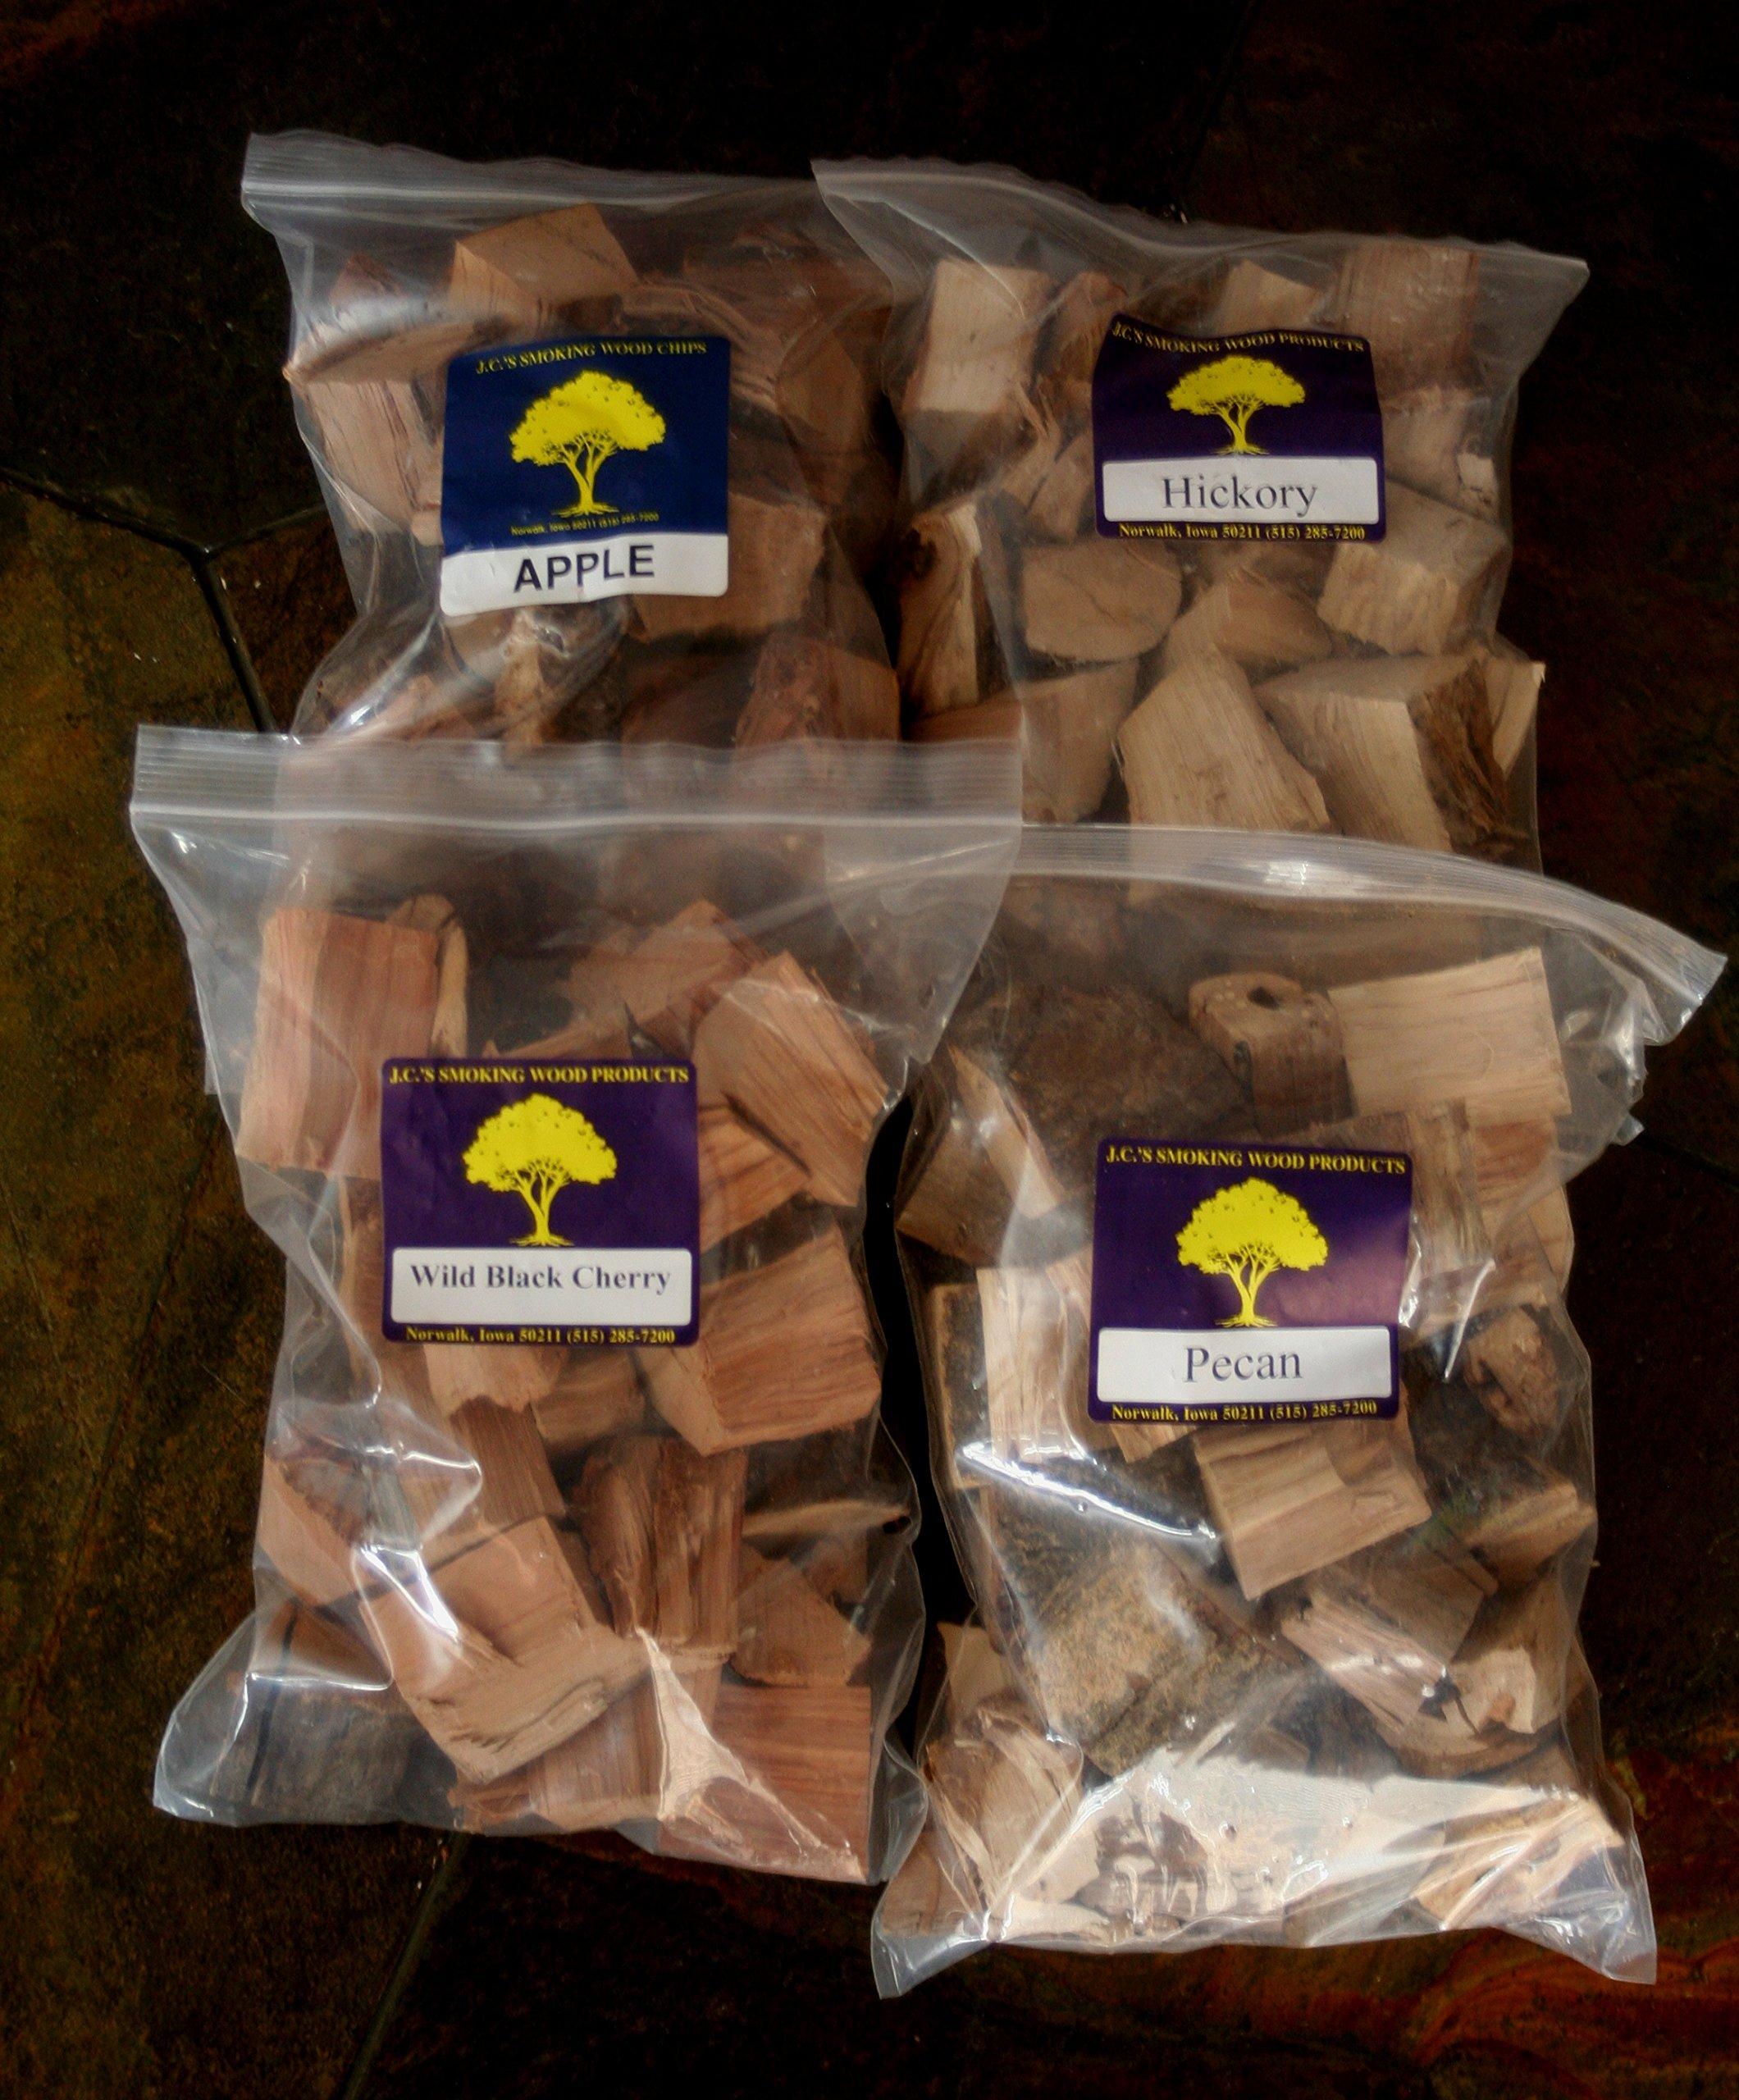 J.C.'s Smoking Wood Chunks - Premium 4 PK Gallon Sized bag of Apple, Hickory, Pecan, Wild Black Cherry by J.C.'s Smoking Wood Products